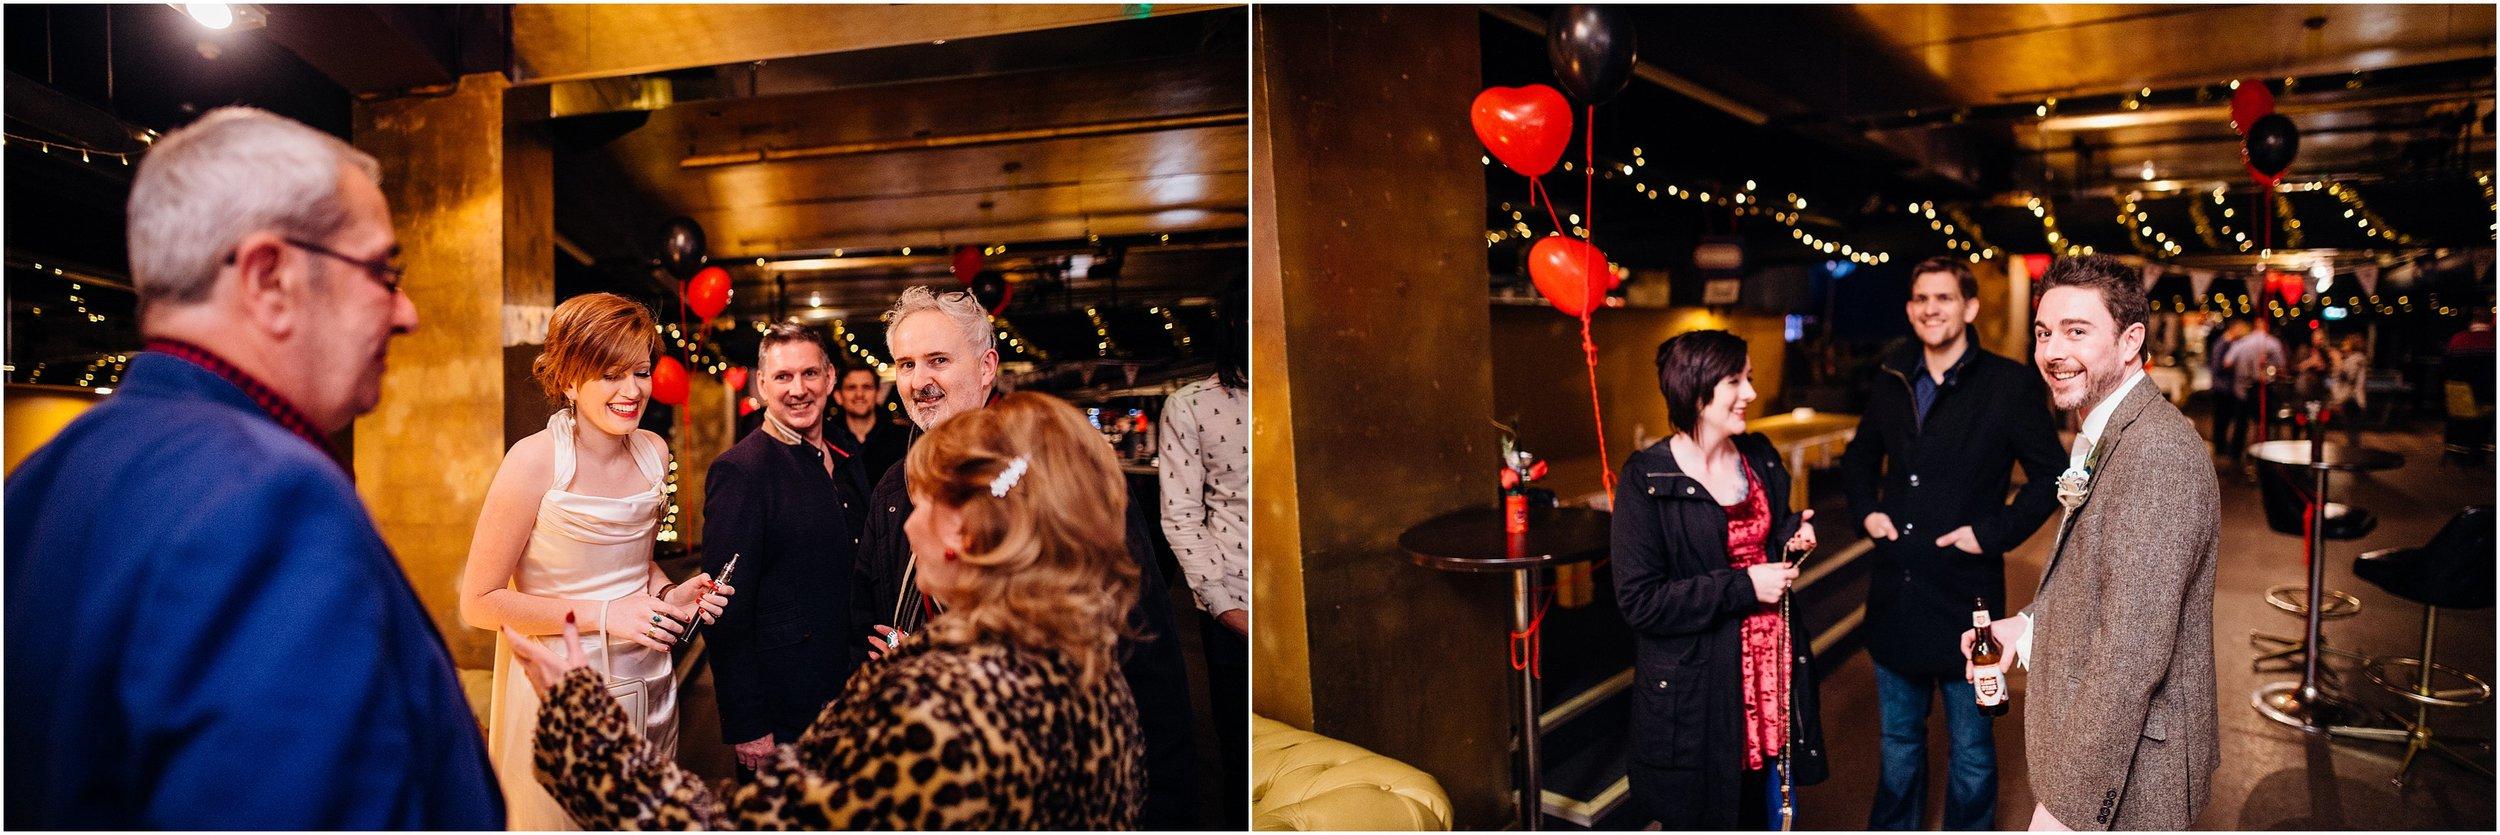 Bloomsbury Bowling london wedding photographer_0086.jpg